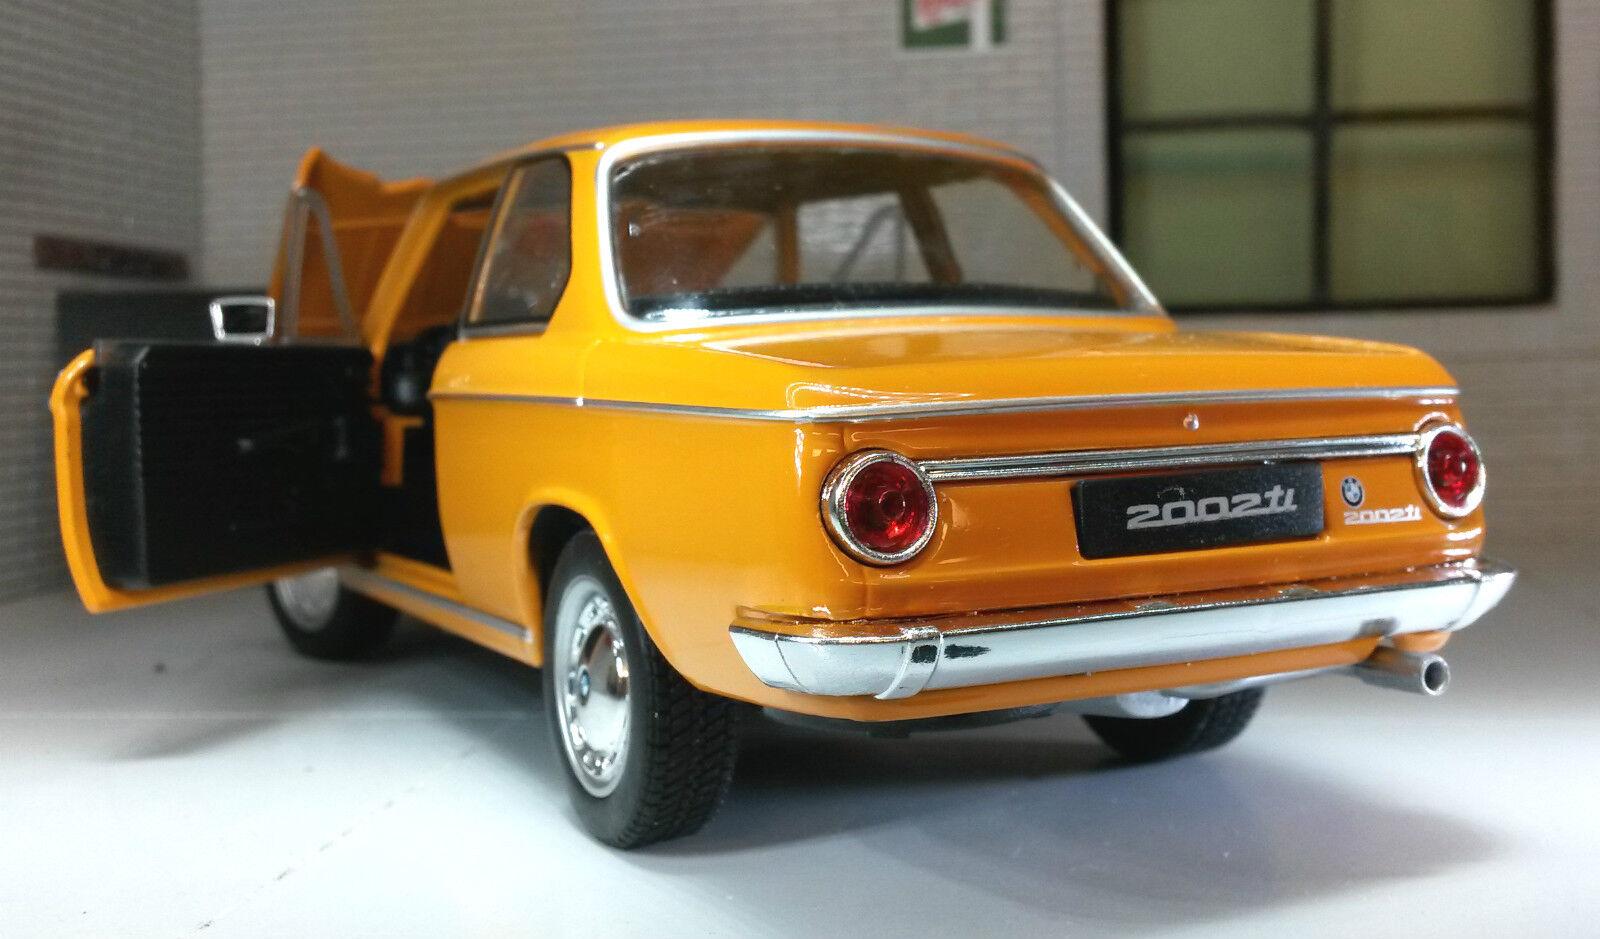 G LGB 1 24 Escala BMW 2002 Ti Tii 1966 1966 1966 Detallado Welly Fundido Modelismo Coche 4a41fe